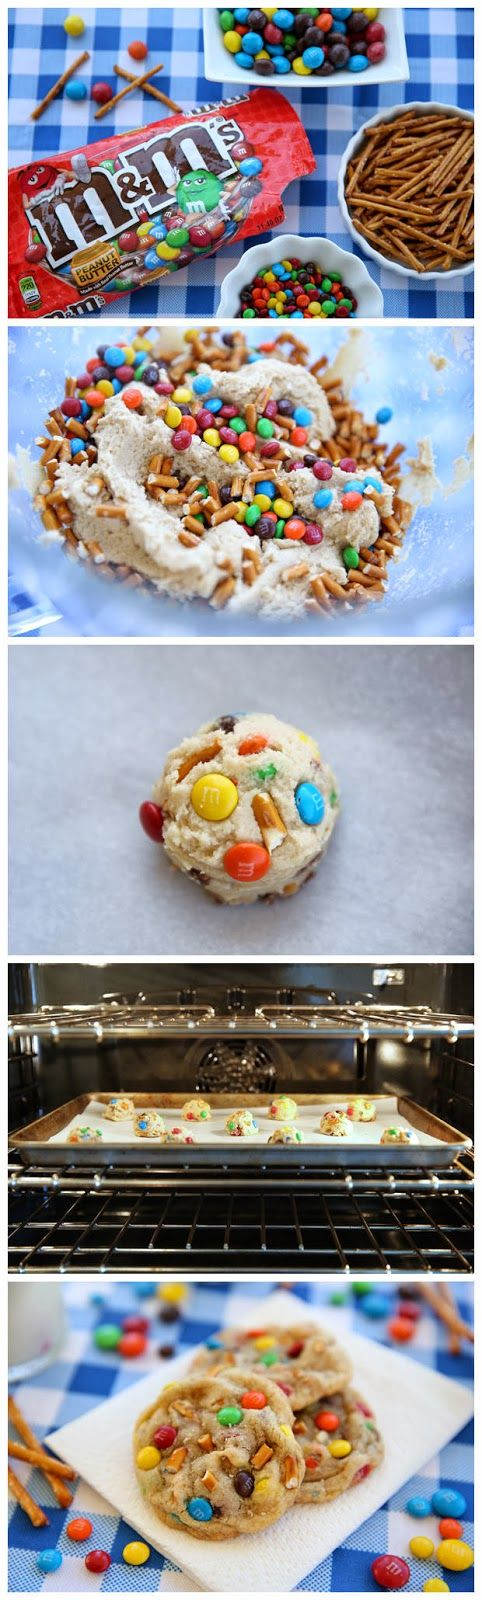 Salted Peanut Butter Pretzel M&M'S Cookies